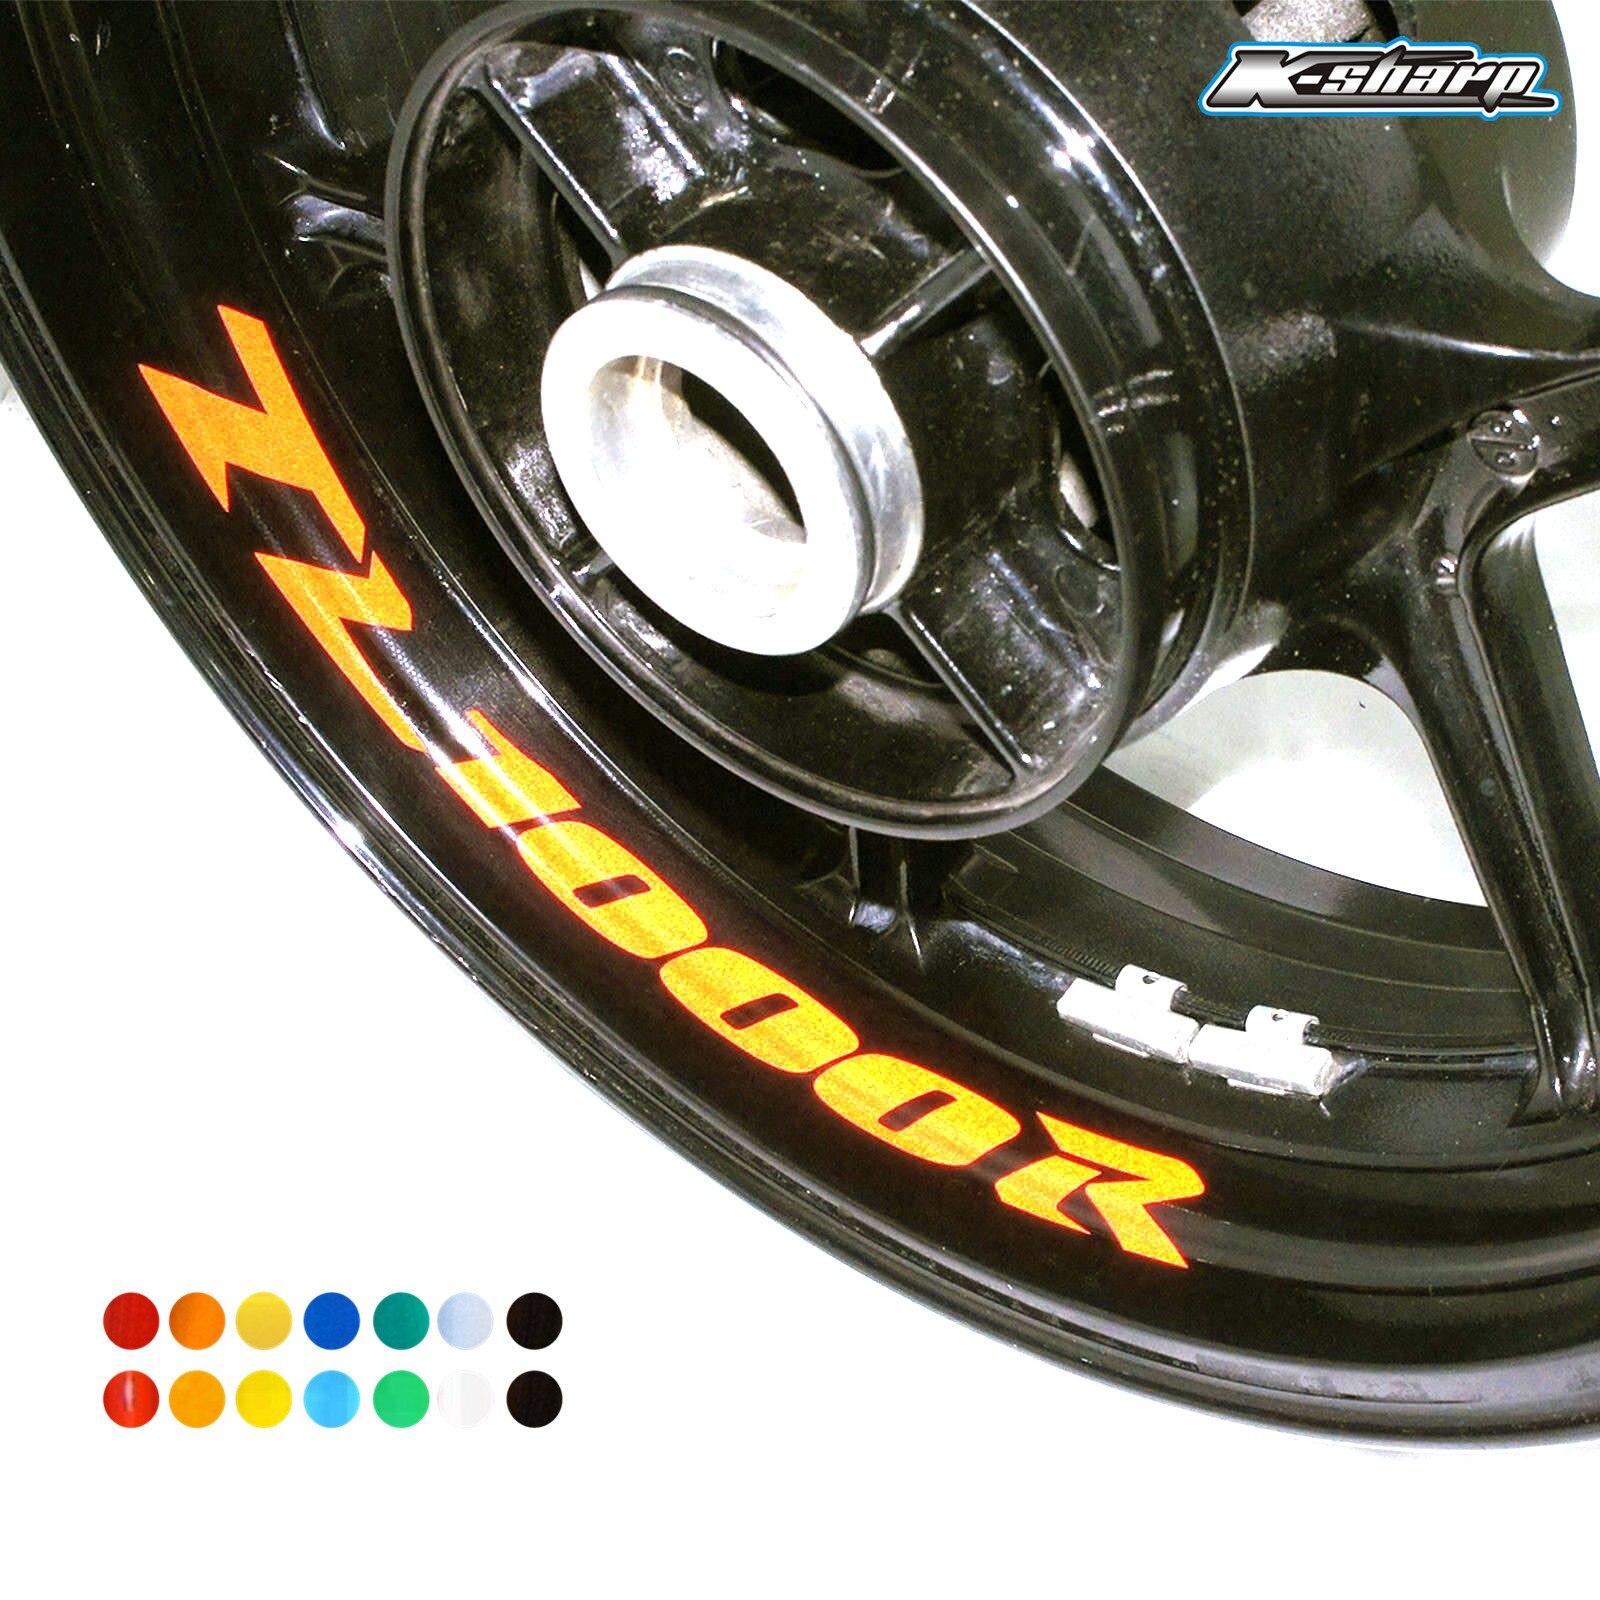 8 X Custon Inner Rim Decals Wheel Reflective Stickers Stripes FIT SUZUKI TL1000R